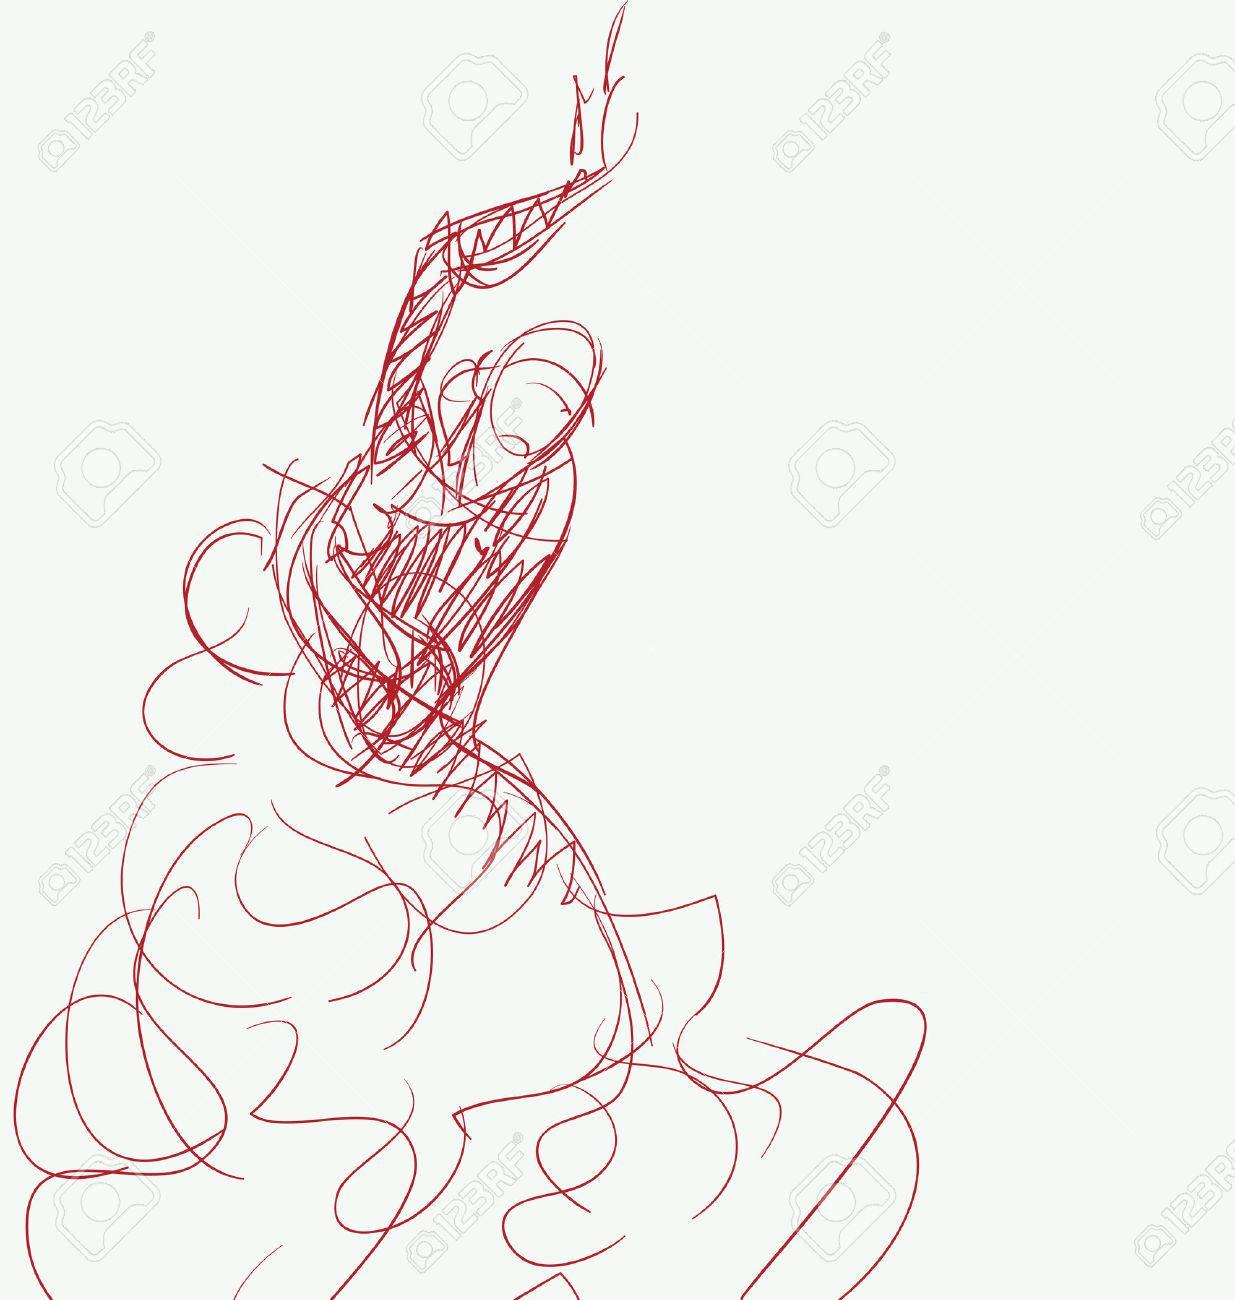 1235x1300 Stilized In Sketch Silhouette Of Spanish Flamenco Dancer Royalty